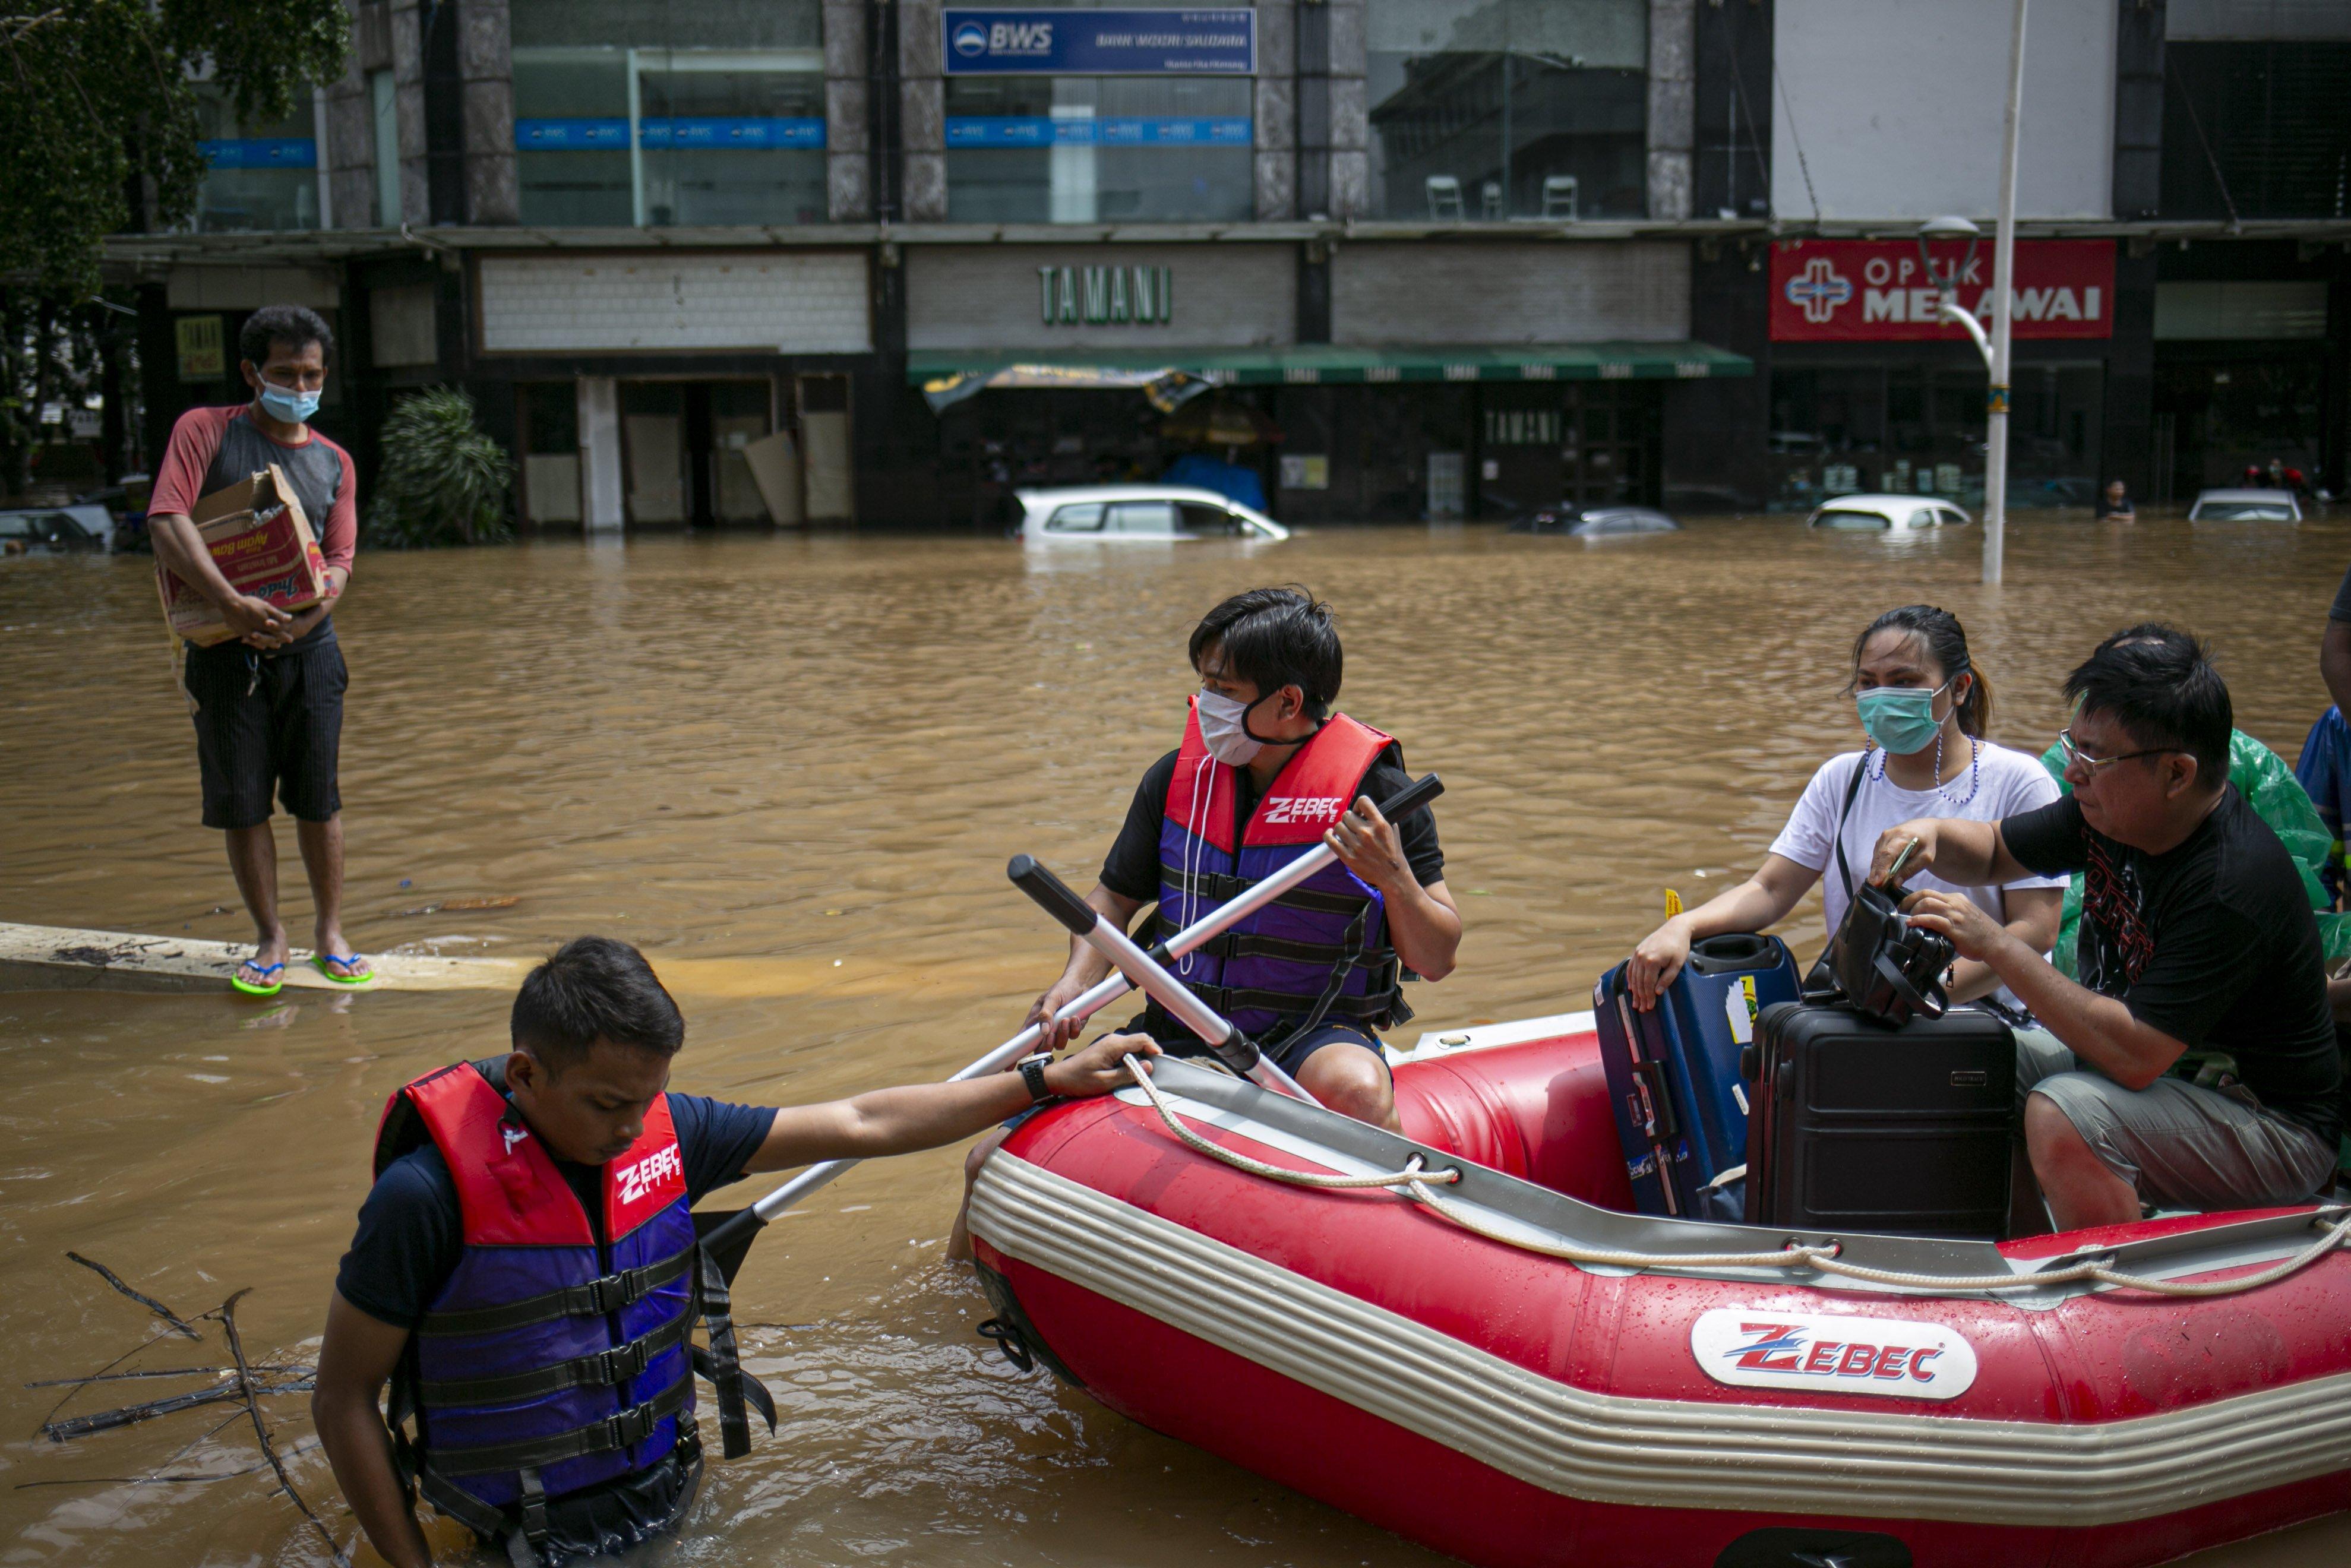 Petugas mengevakuasi warga yang terjebak banjir di kawasan Kemang, Jakarta Selatan, Sabtu (20/2/2021). Banjir yang terjadi akibat curah hujan tinggi serta drainase yang buruk membuat kawasan Kemang banjir setinggi 1,5 meter.